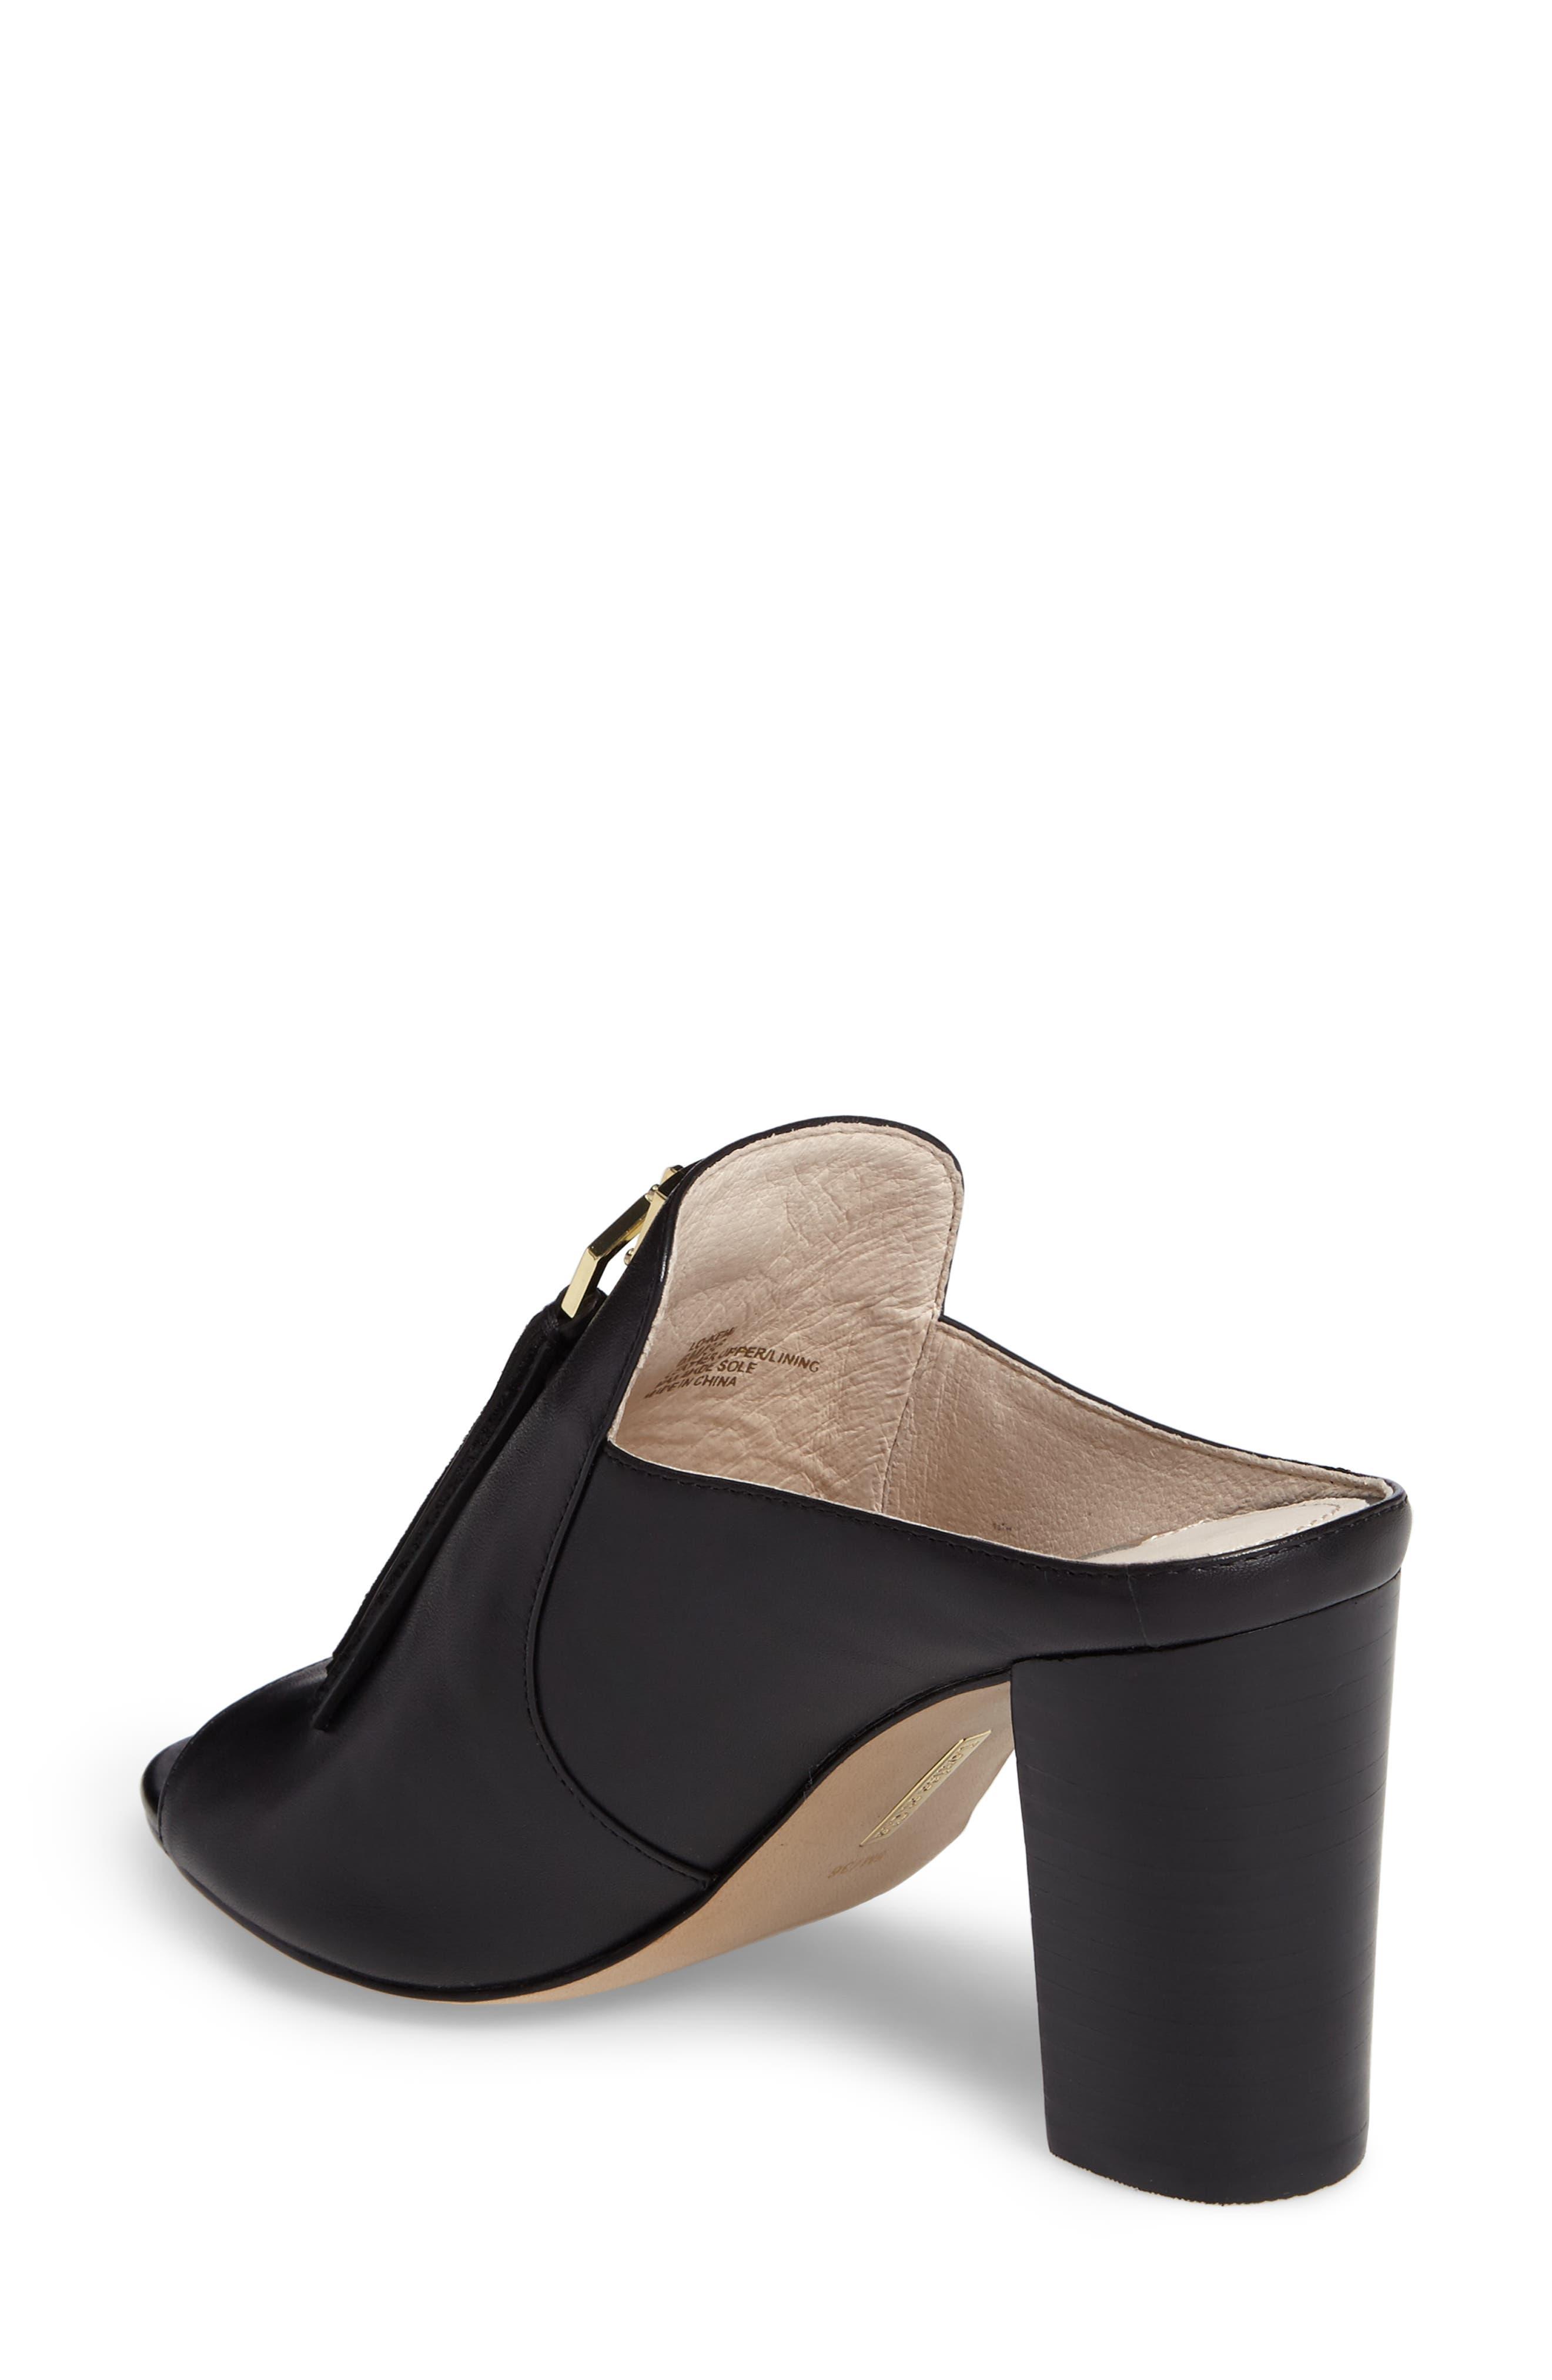 Kemi Block Heel Sandal,                             Alternate thumbnail 2, color,                             001